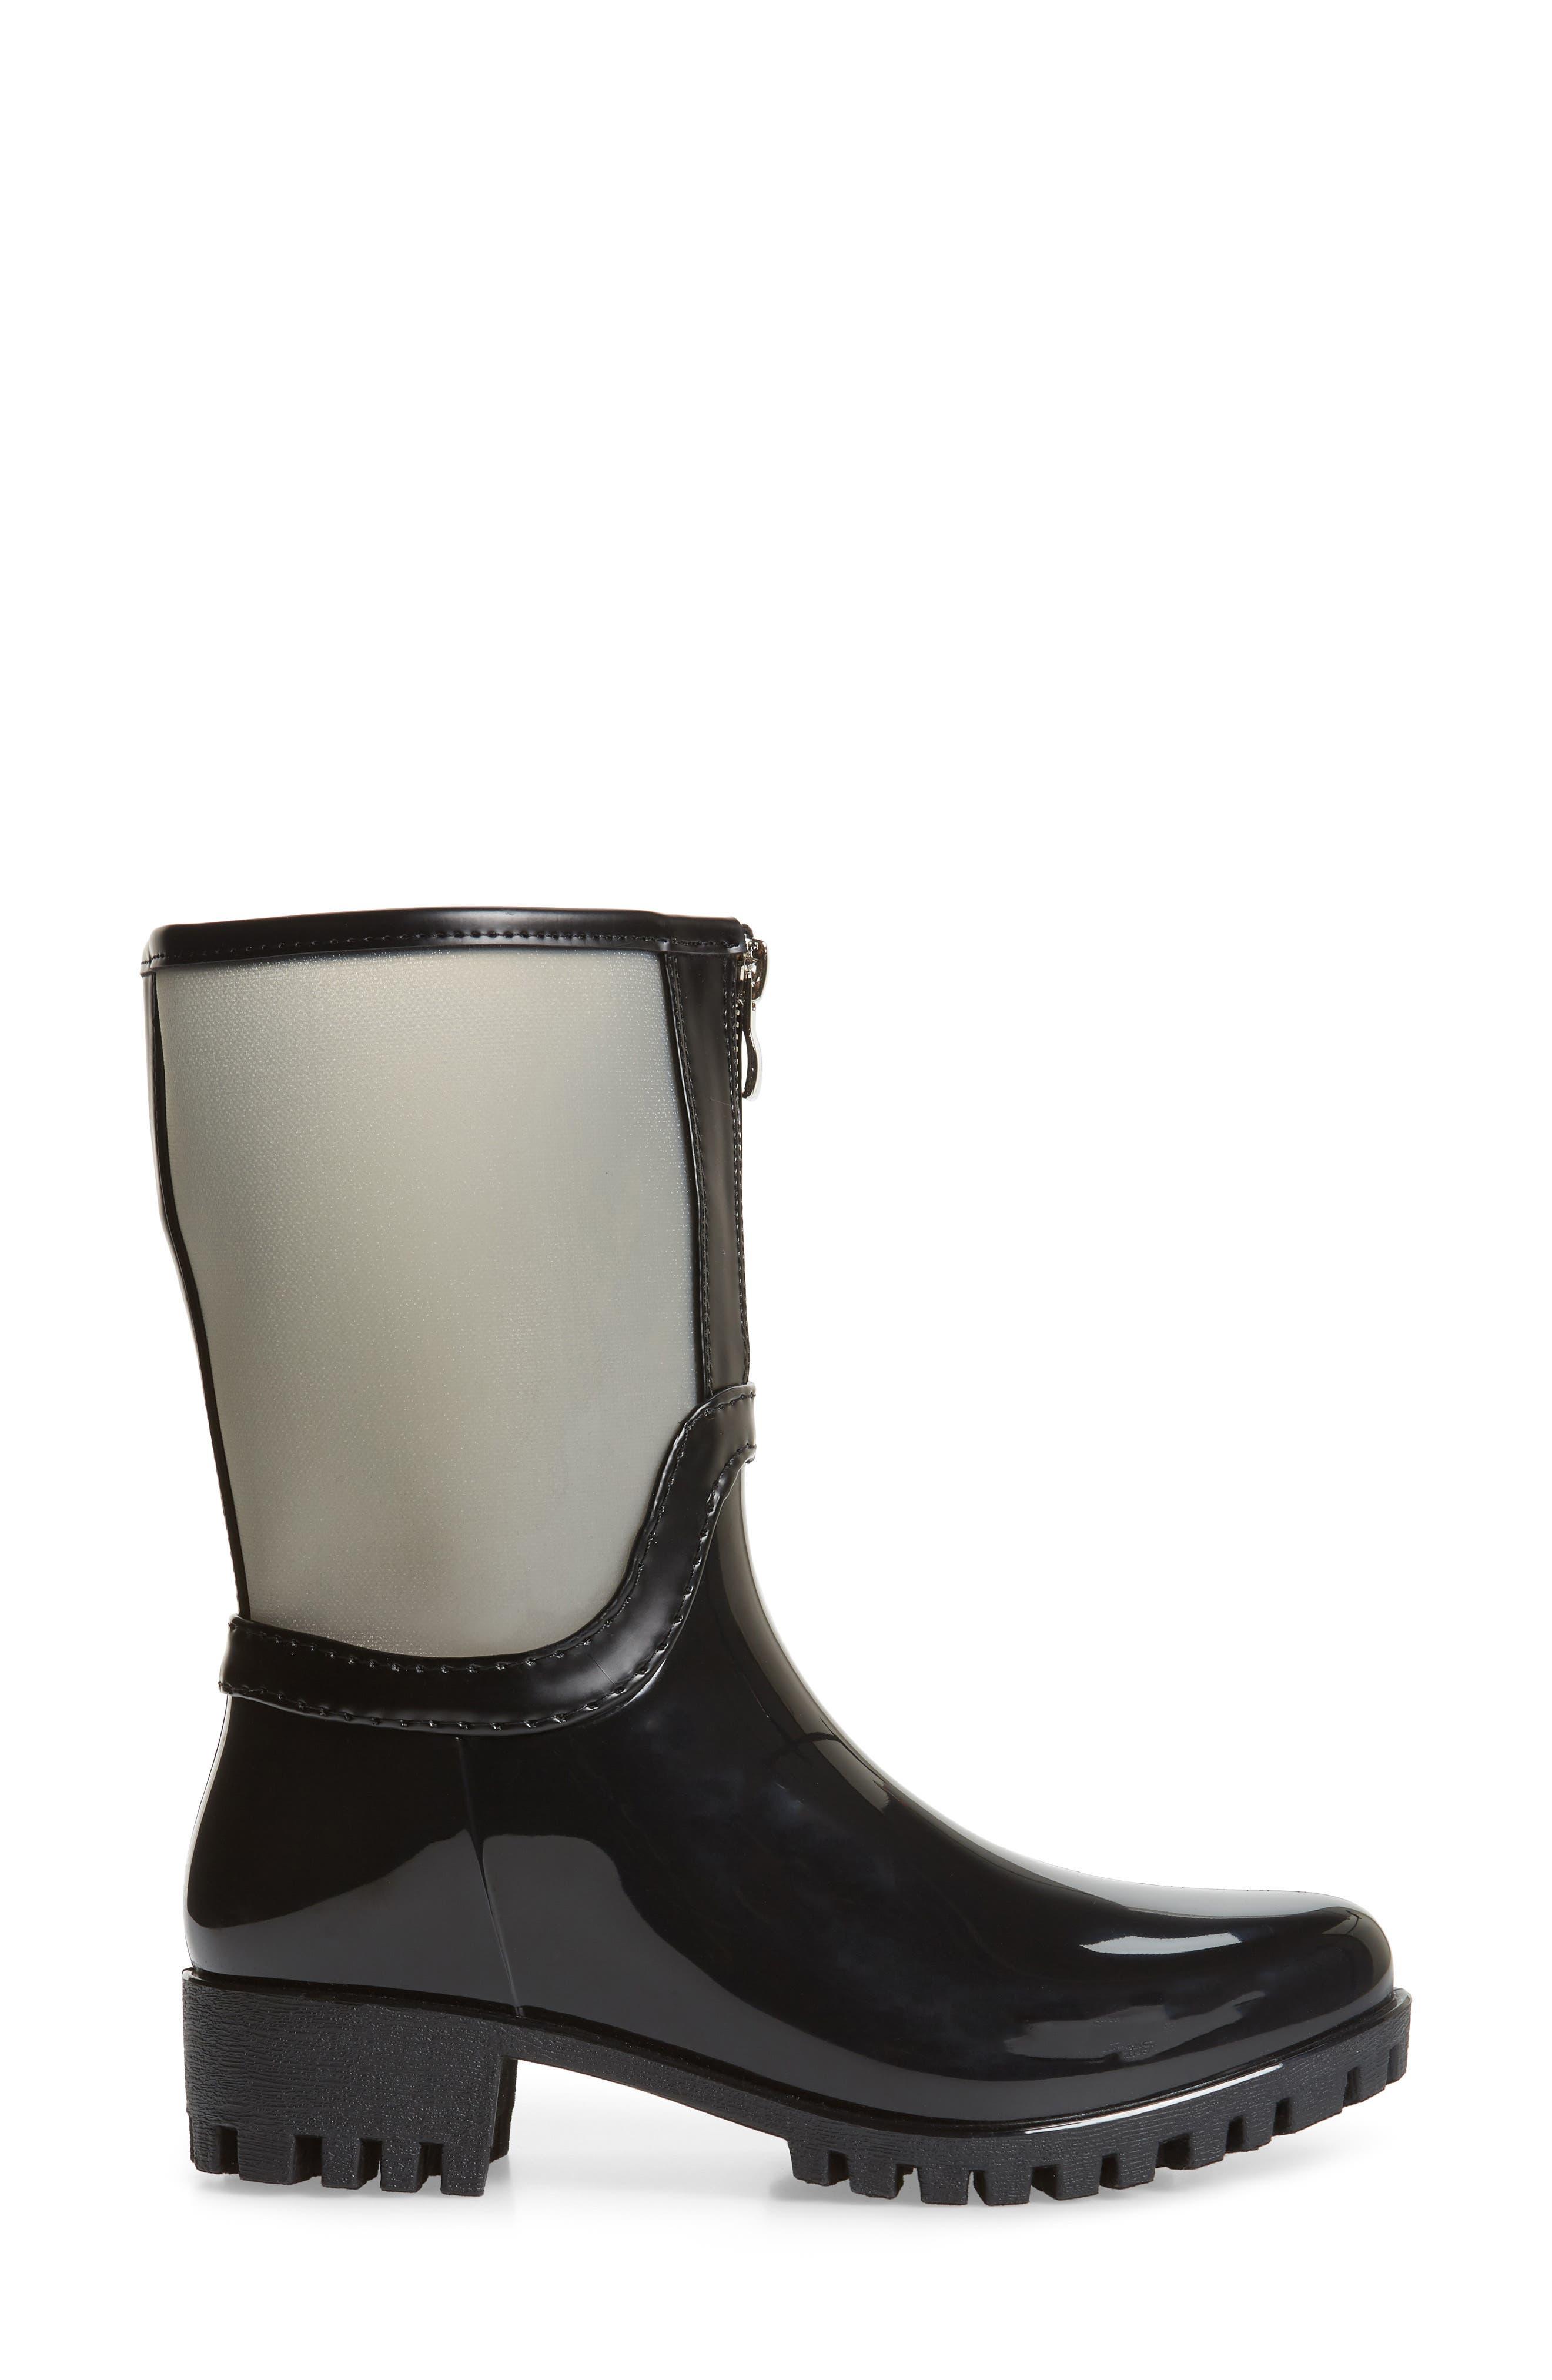 DÄV, Dryden Sheer Waterproof Boot, Alternate thumbnail 3, color, GREY FABRIC